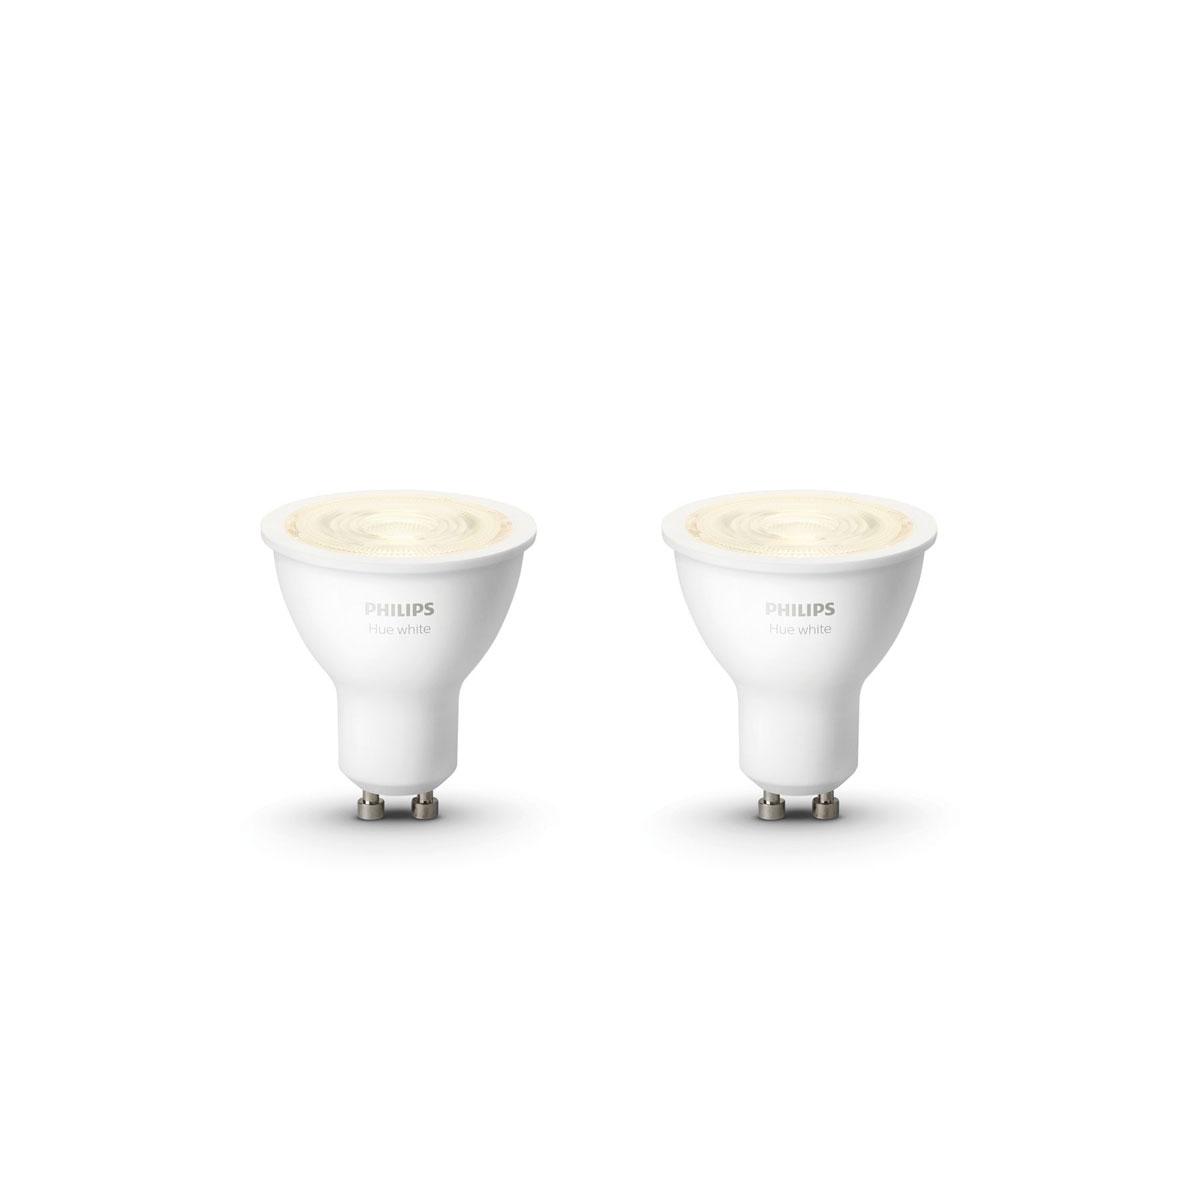 "Philips Hue LED-Reflektor ""White"", 5,2W, 2 Stück 2x LED-Reflektor"